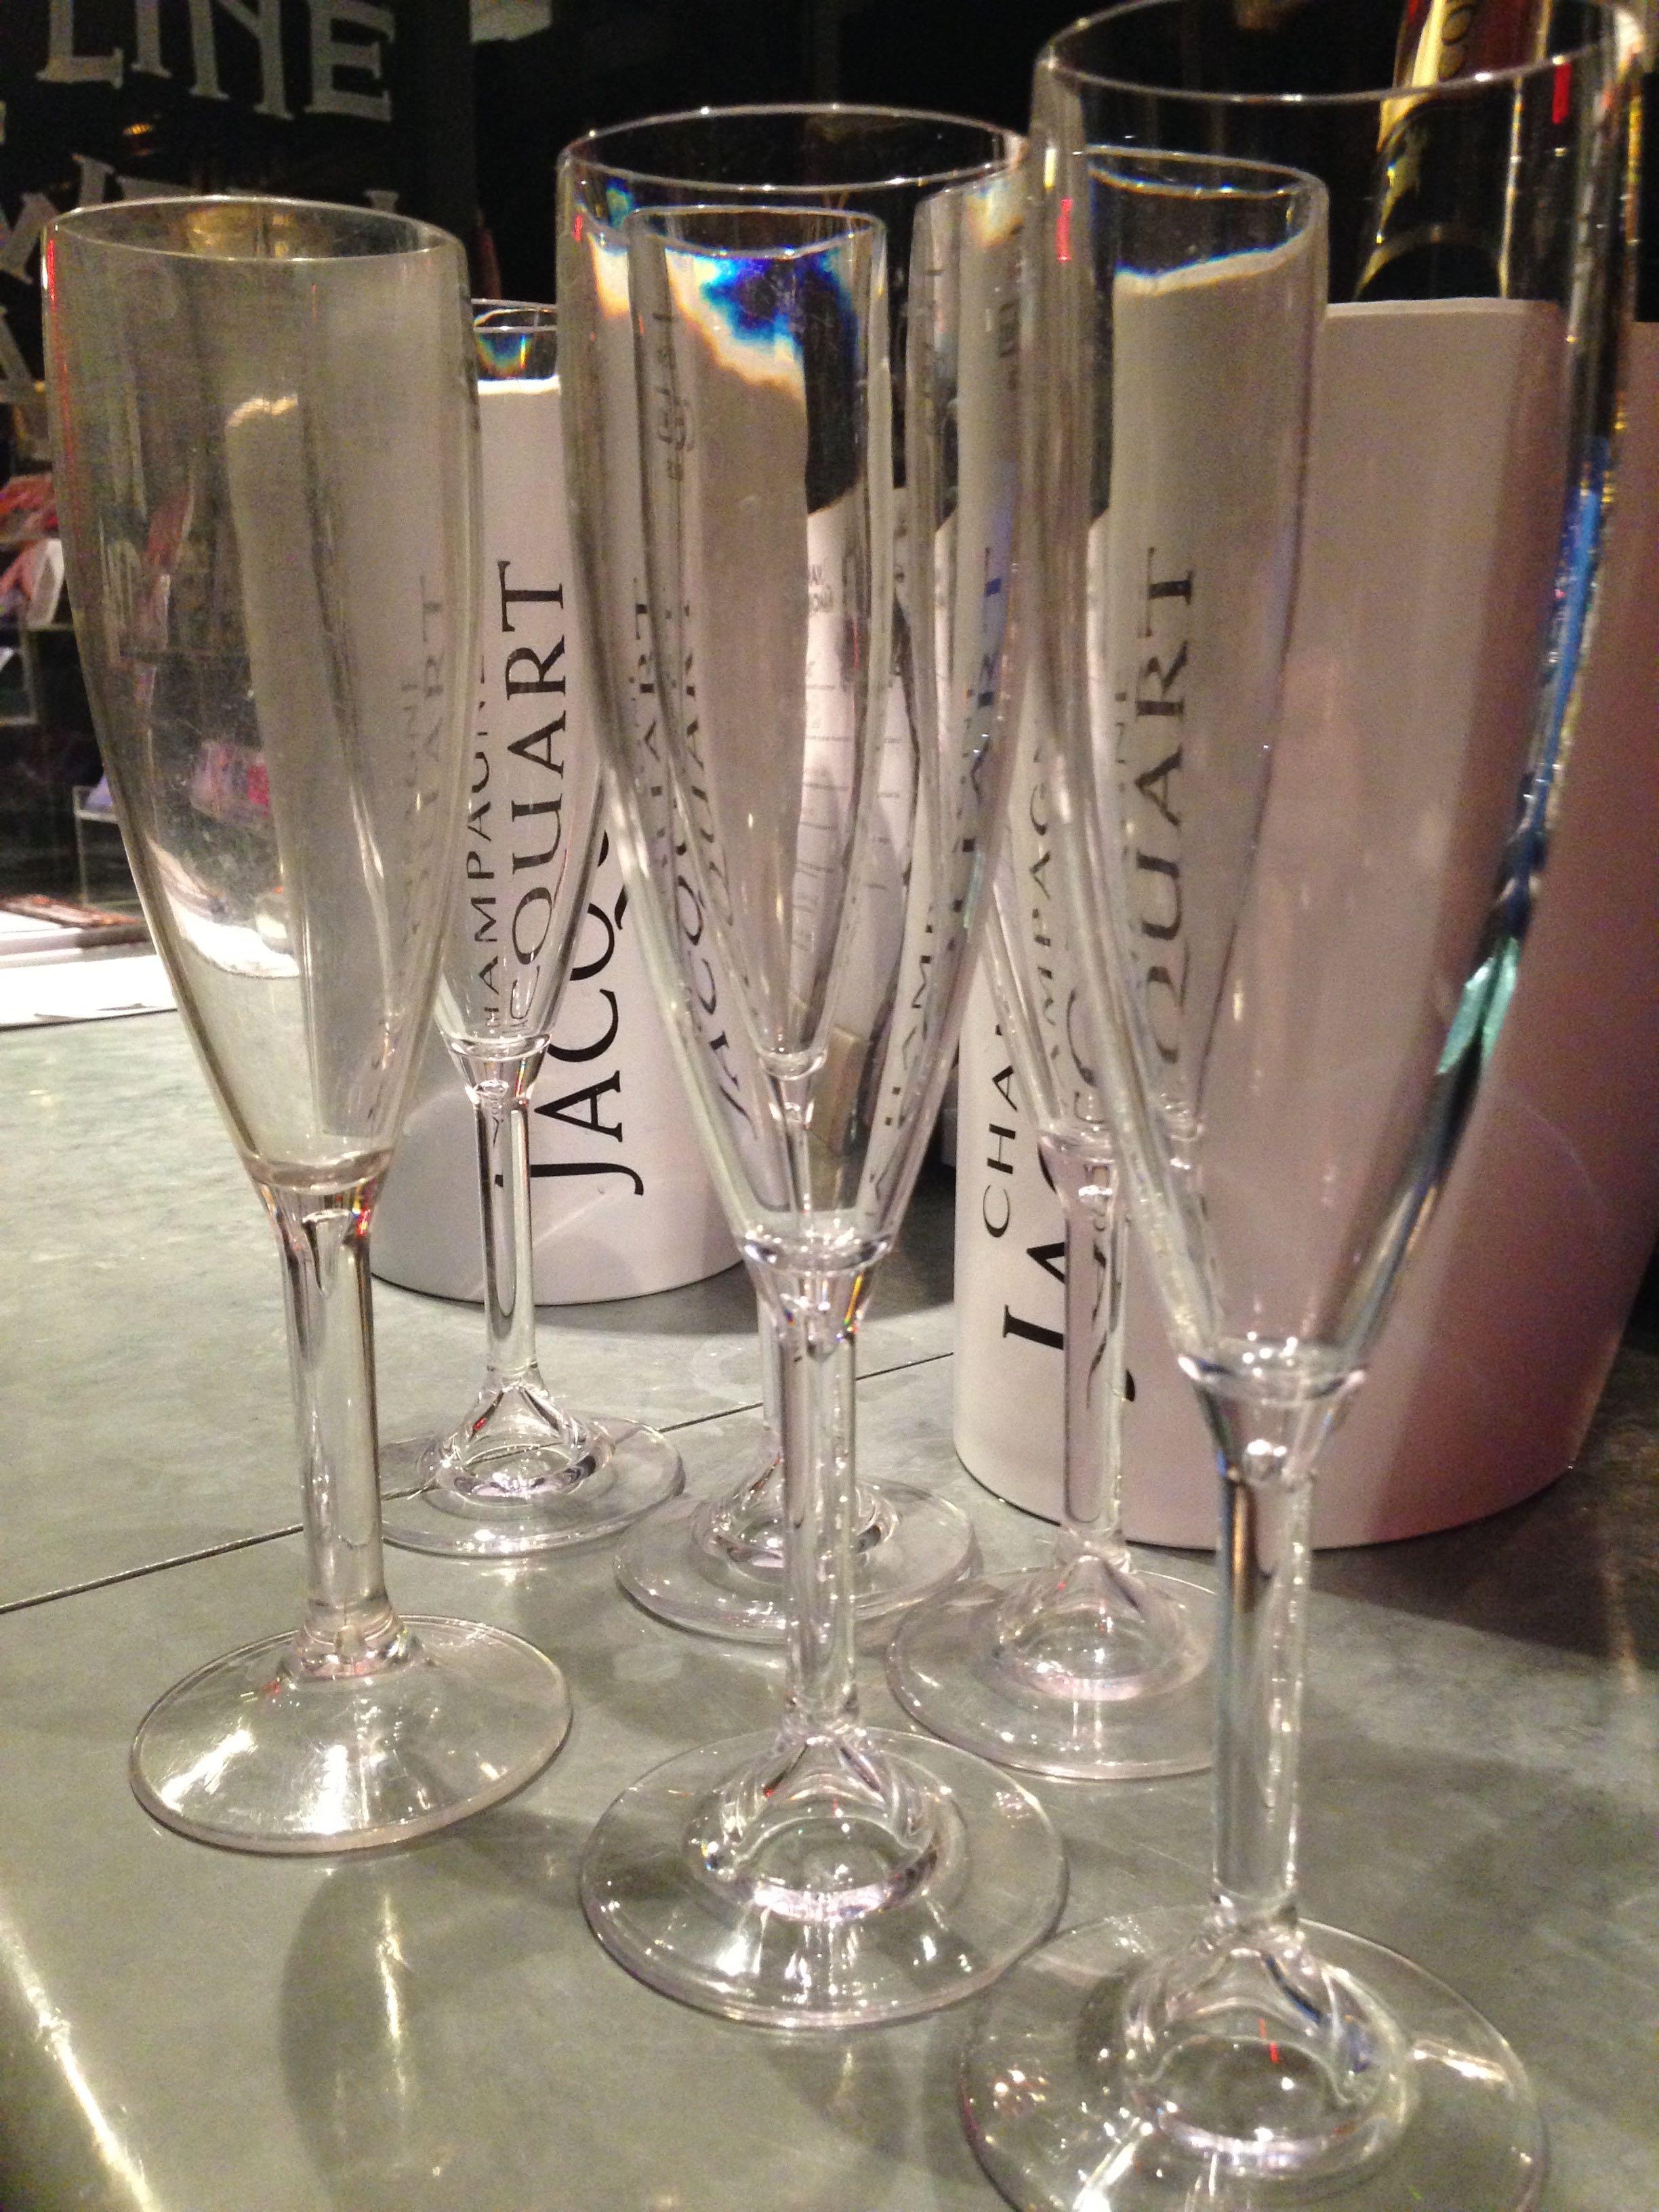 Jacquart Champagne glasses